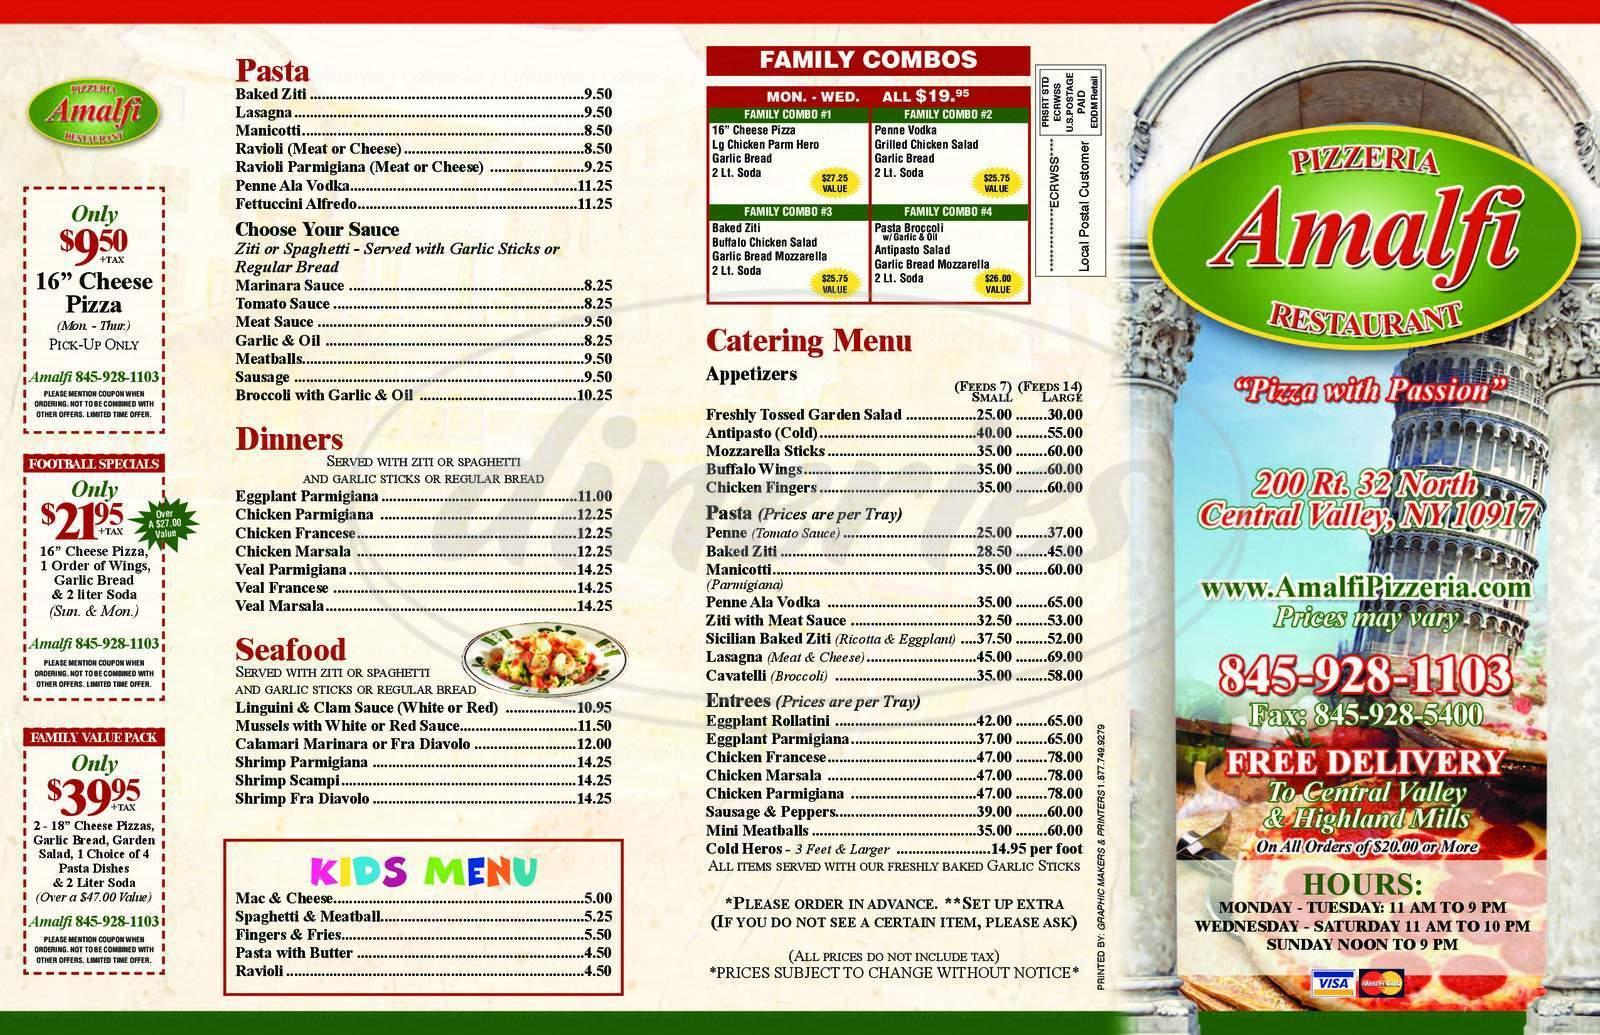 menu for Amalfi Pizzeria